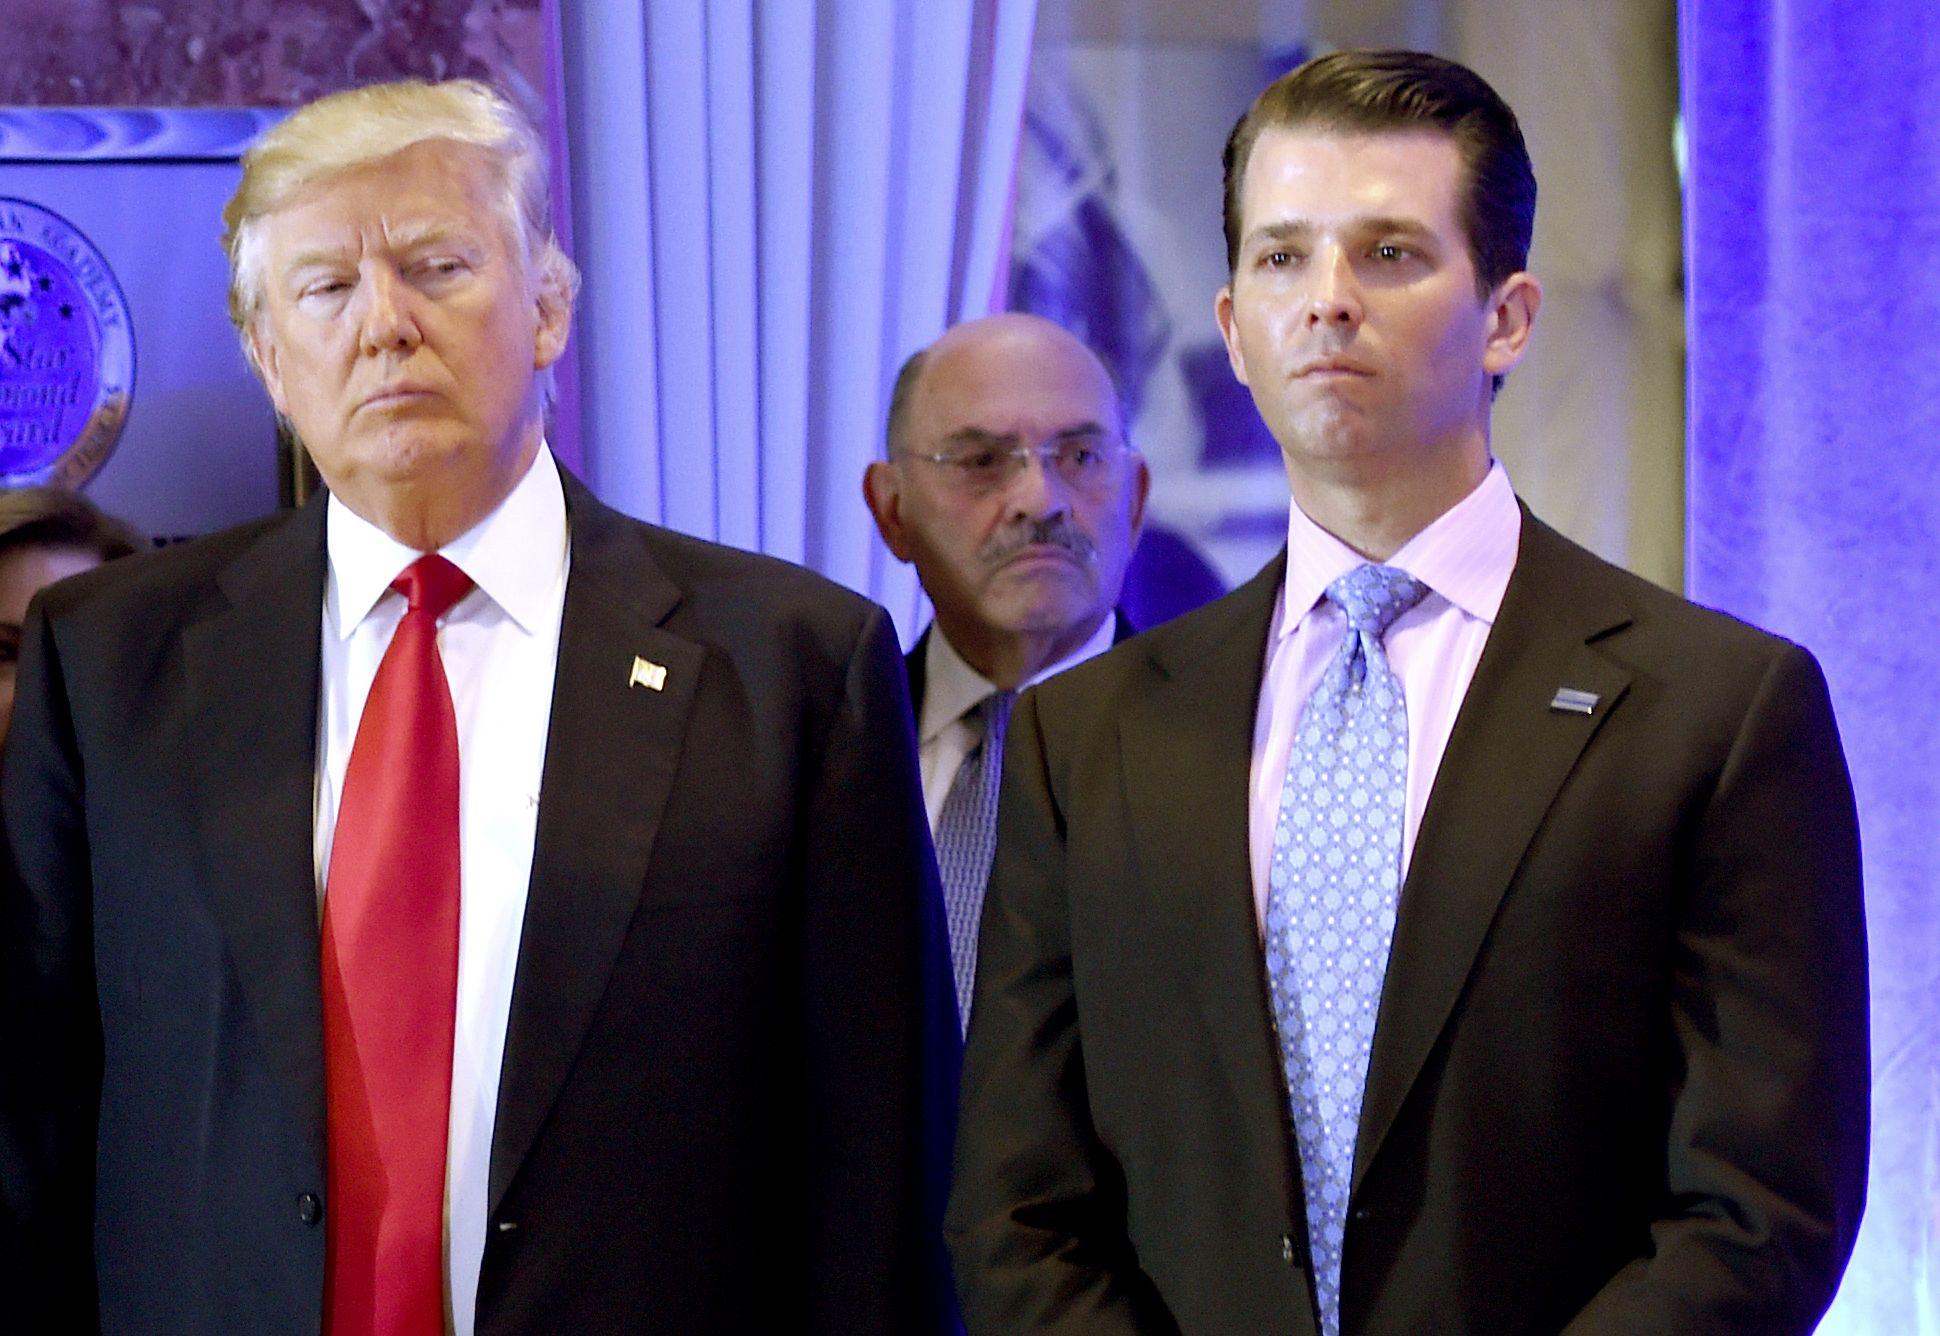 Donald Trump Jr, Allen Weisselberg, Michael Cohen, Democrats